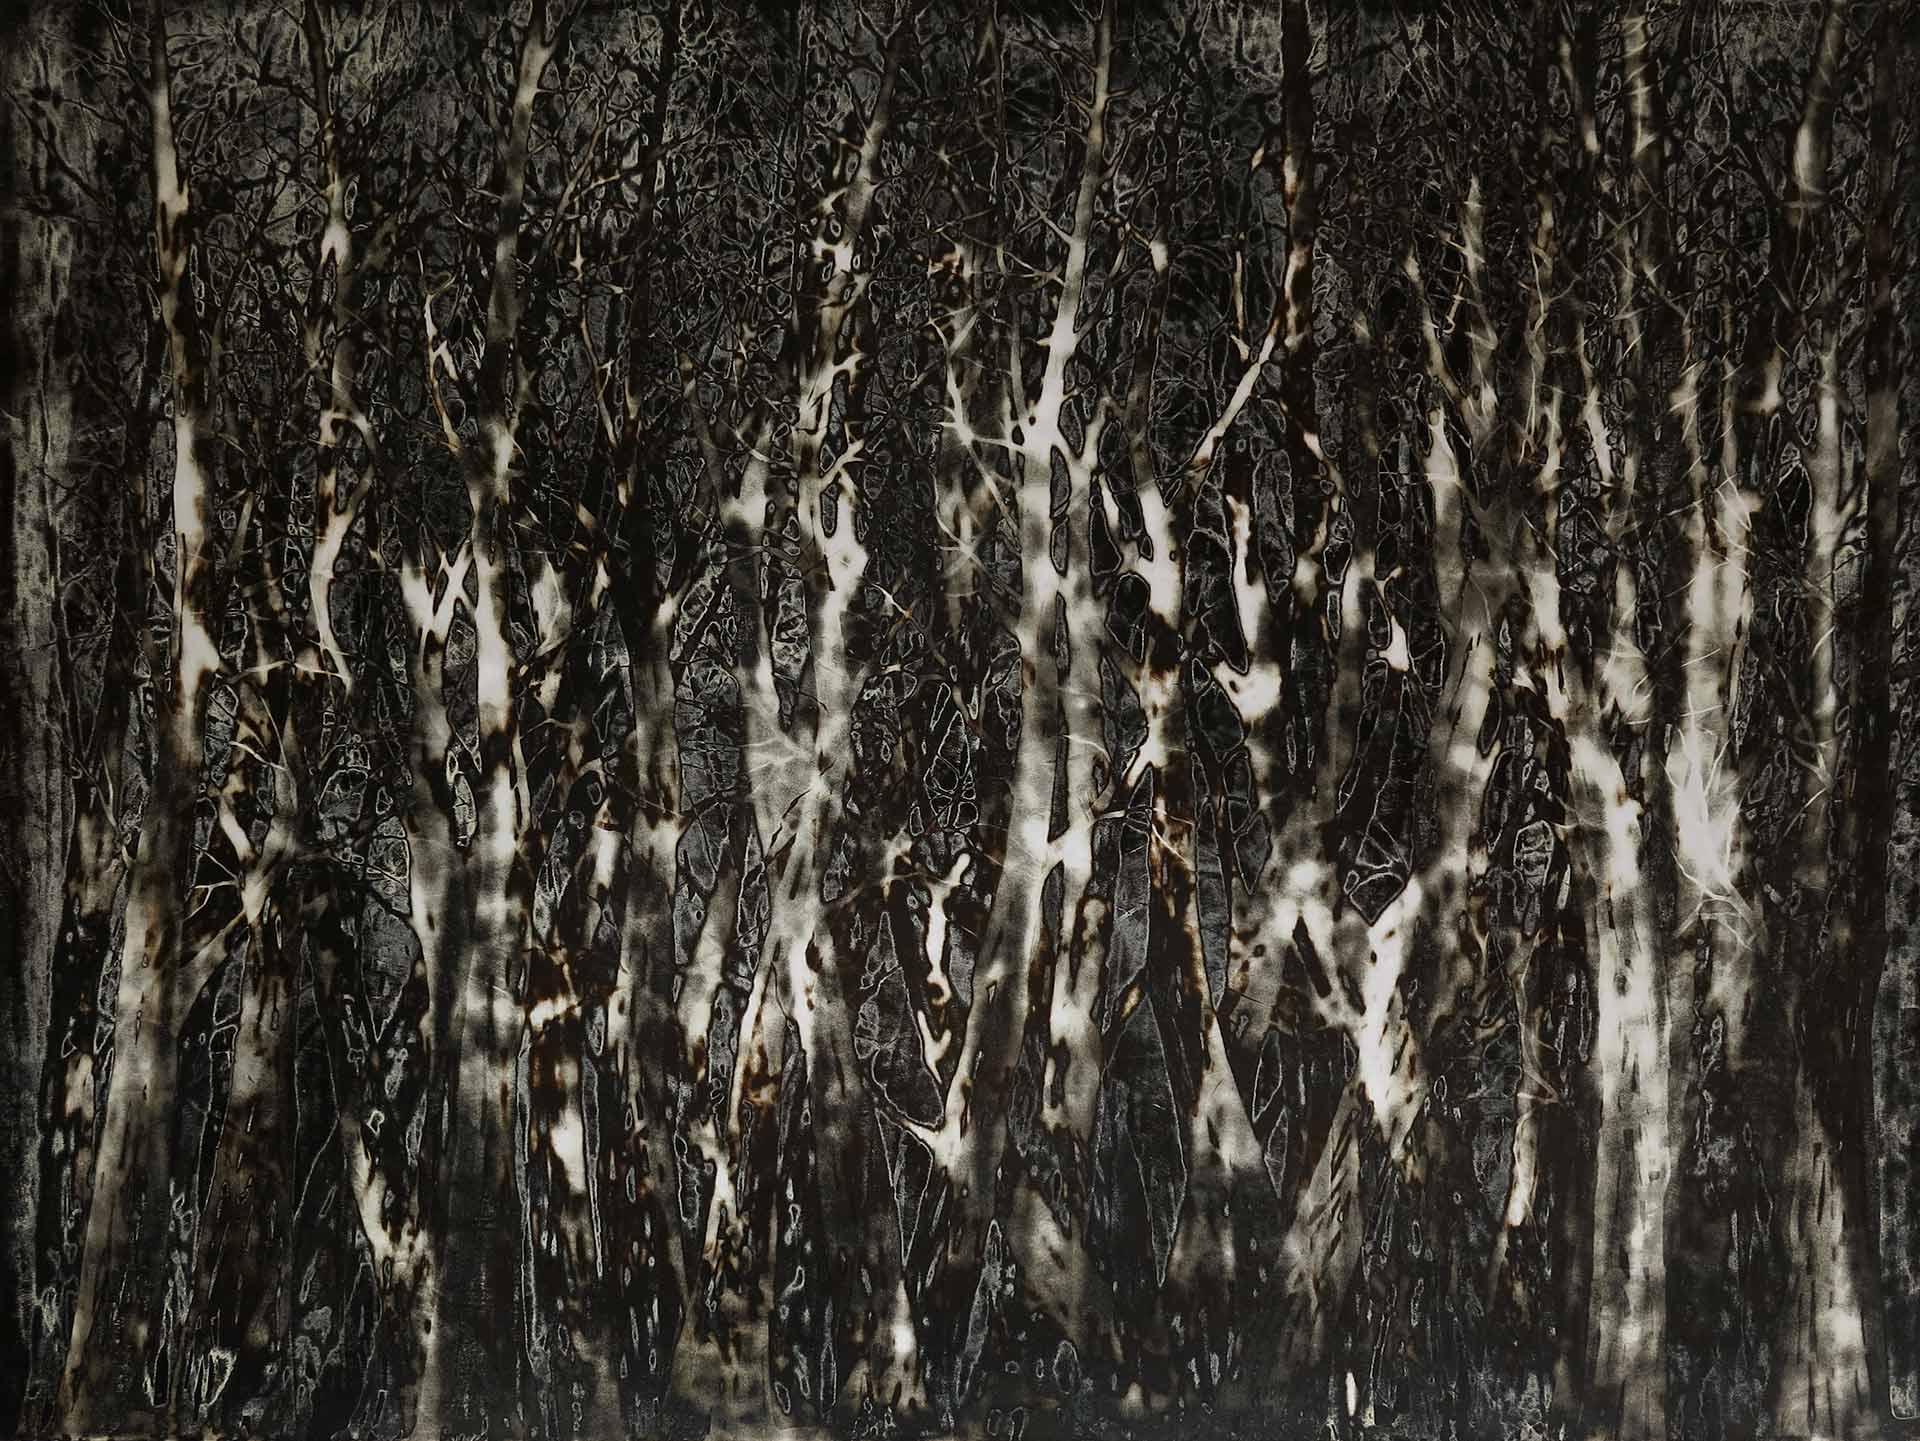 Tuval üzeri akrilik – Acrylic on canvas 170*130 cm